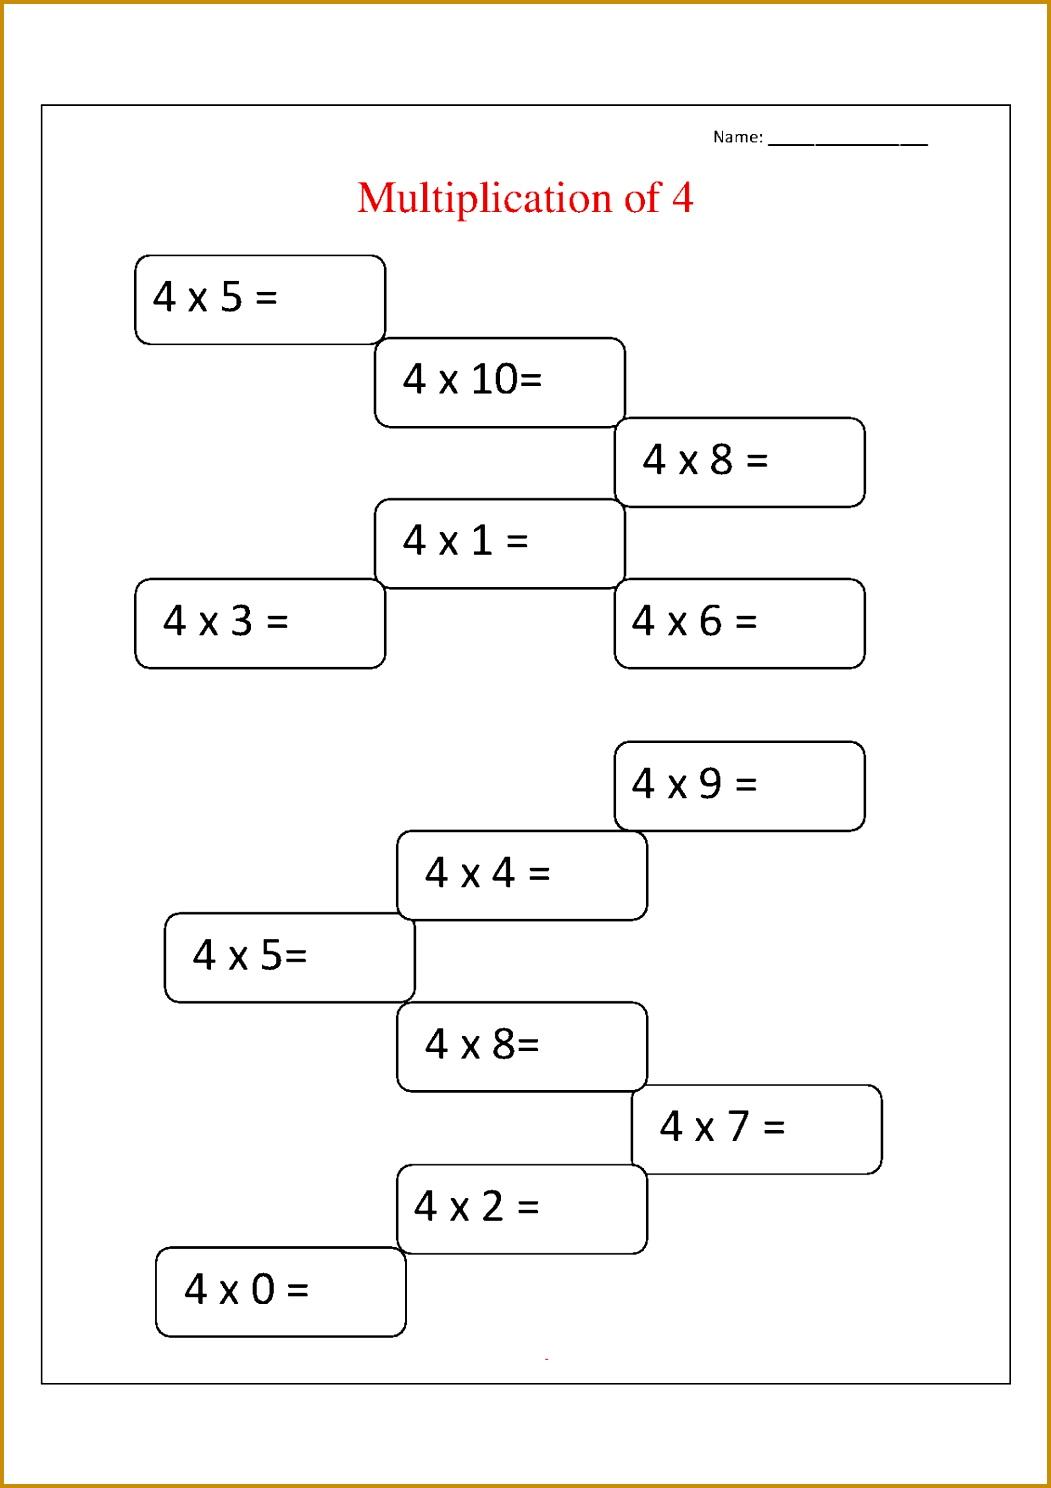 5 Multiplication Facts Worksheet